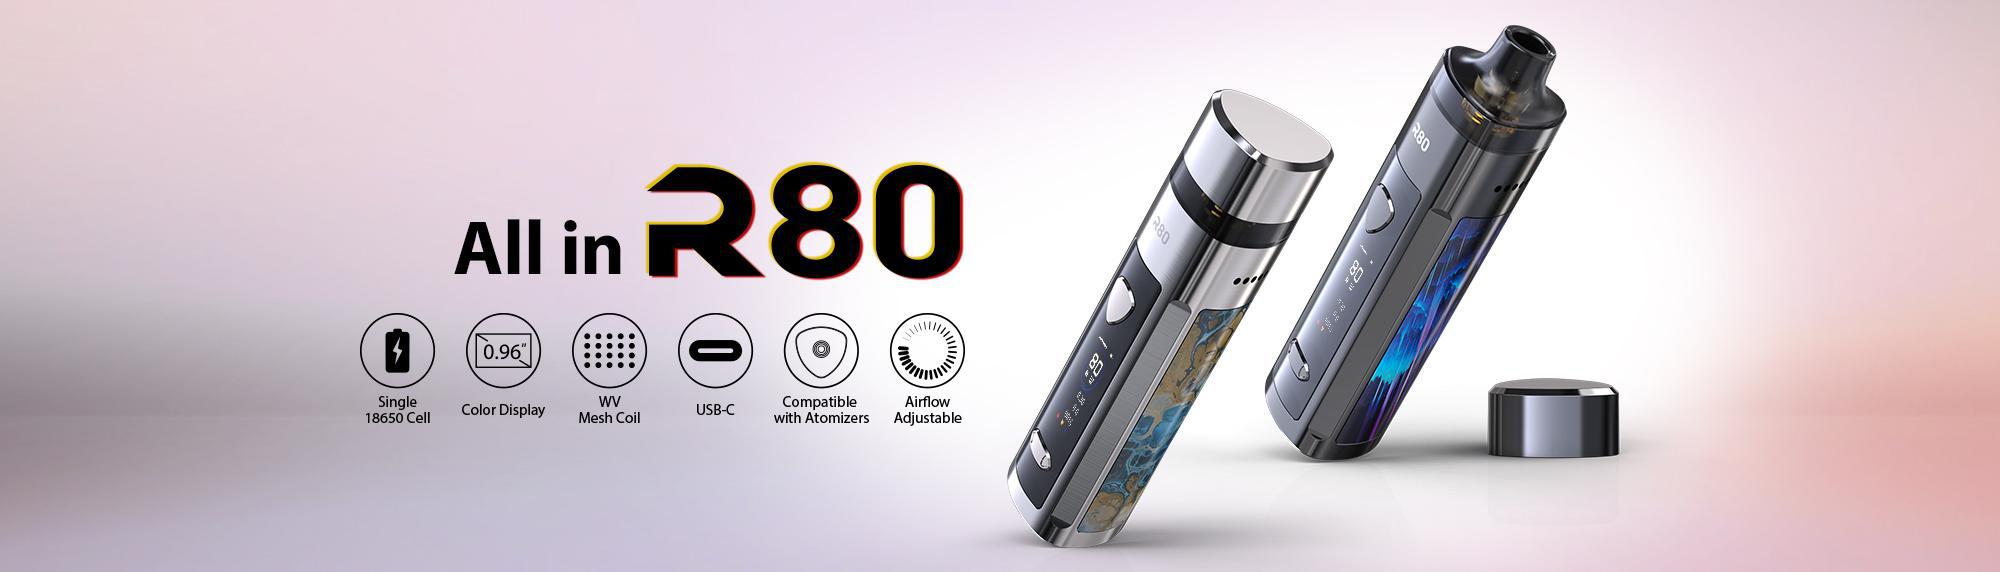 banner-wismec-r80-kit